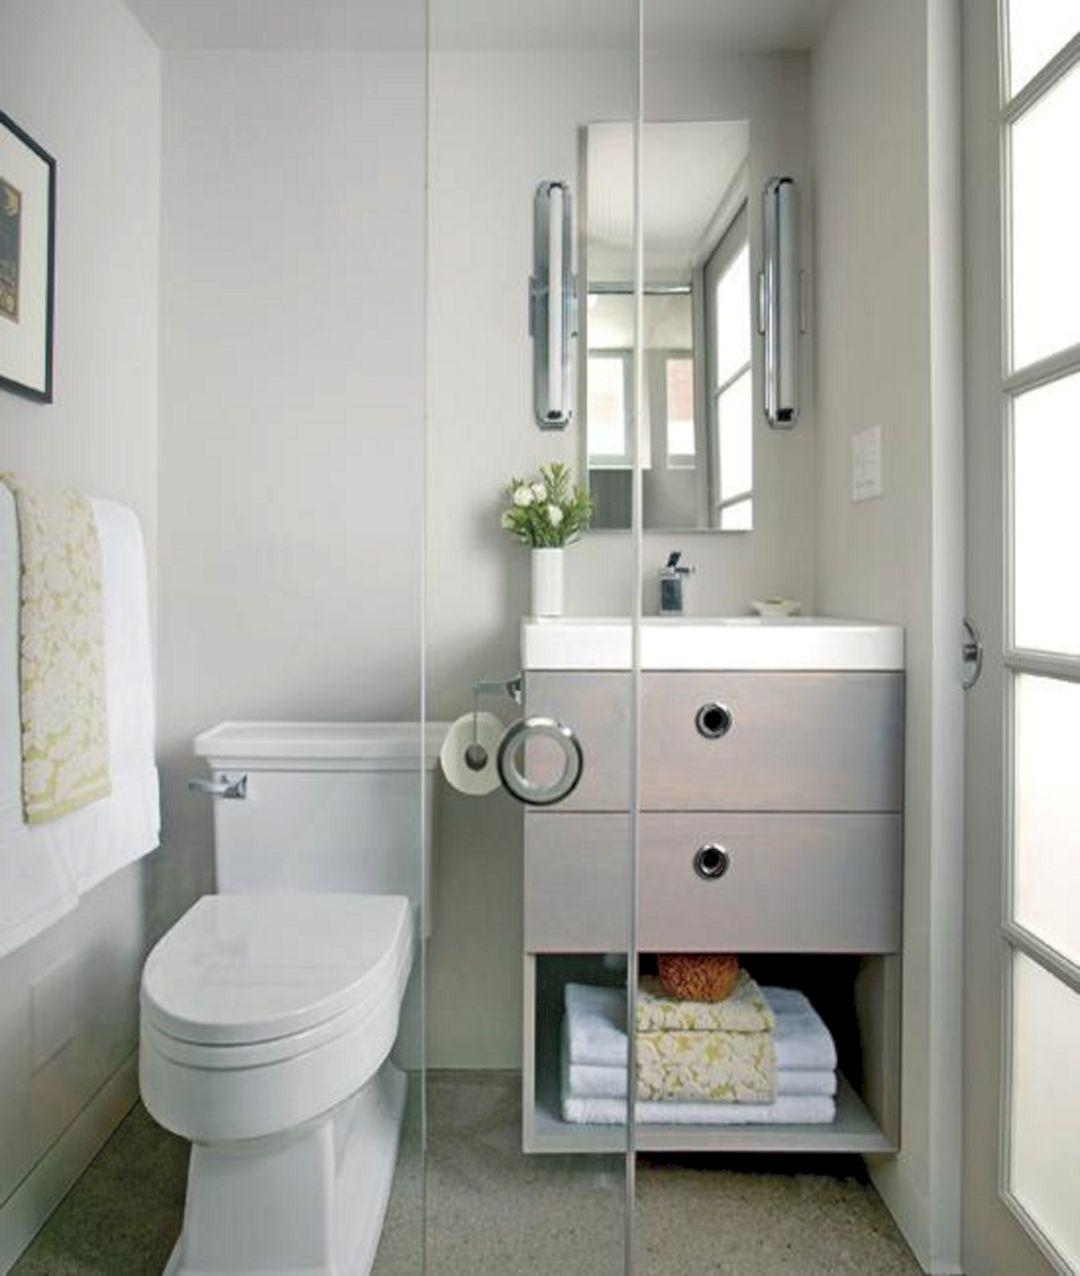 Bathroom Designs Small  Small Bathroom Designs Small Bathroom Designs design